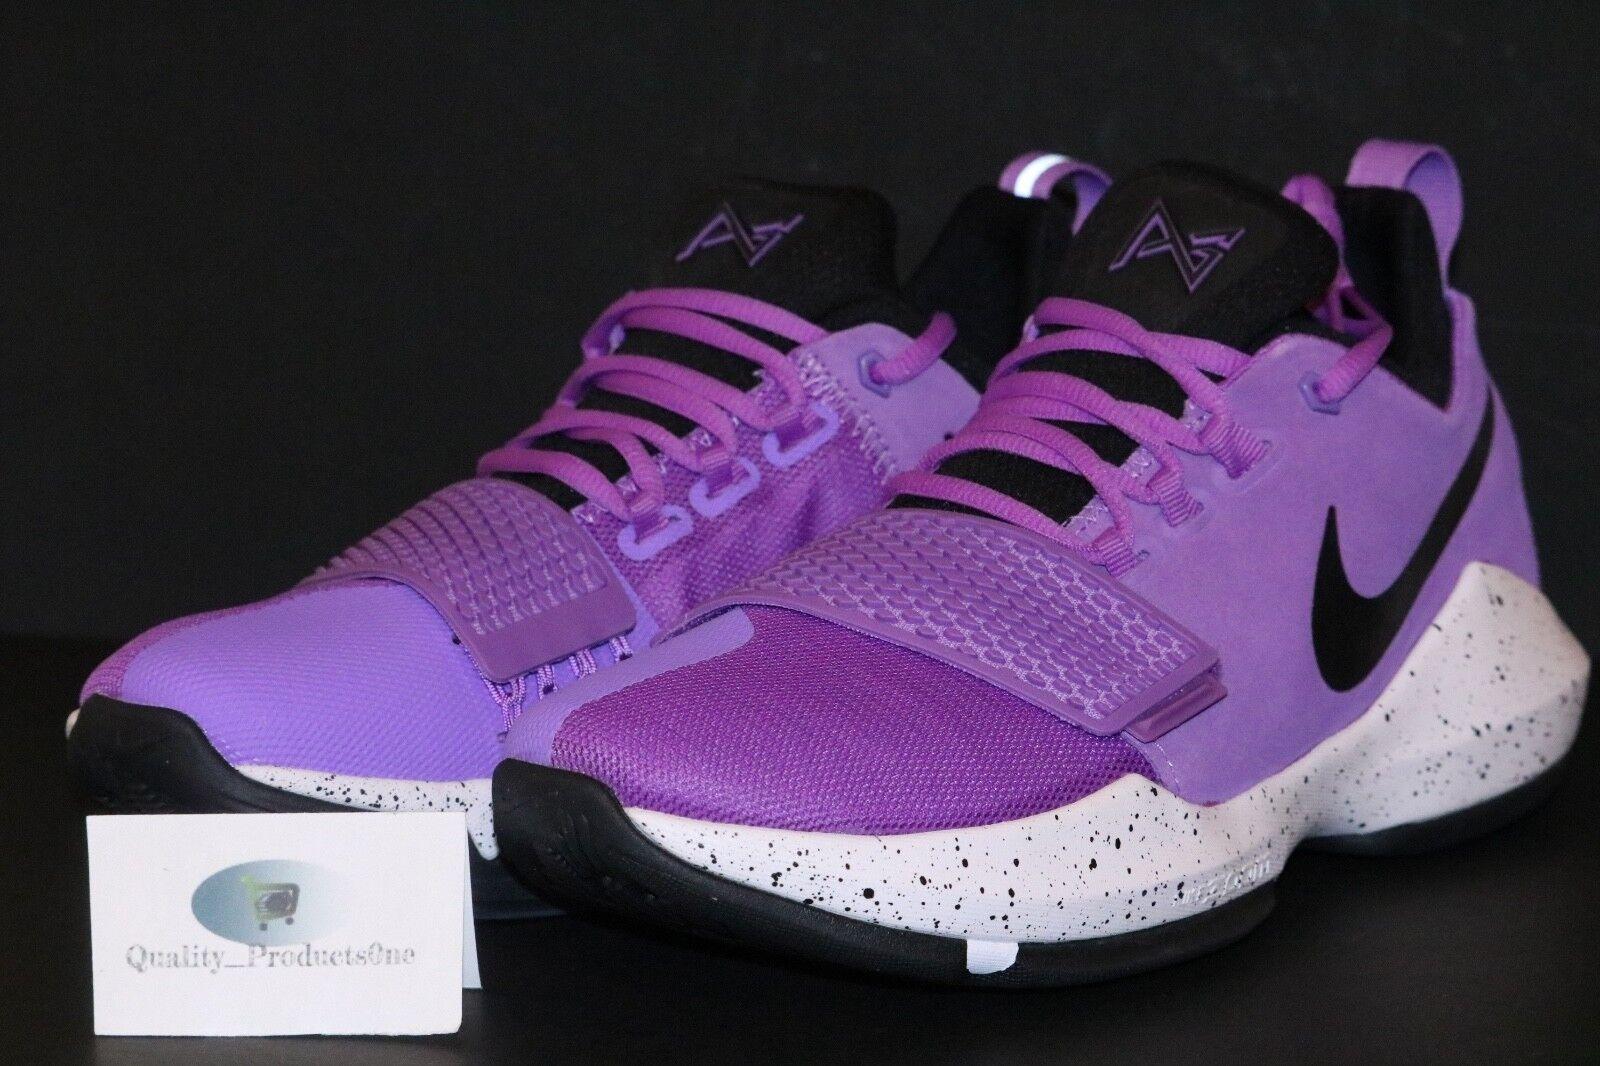 Nike Men's PG 1 Bright Violet Purple Black White Paul George 878627 500 Sz 9-15